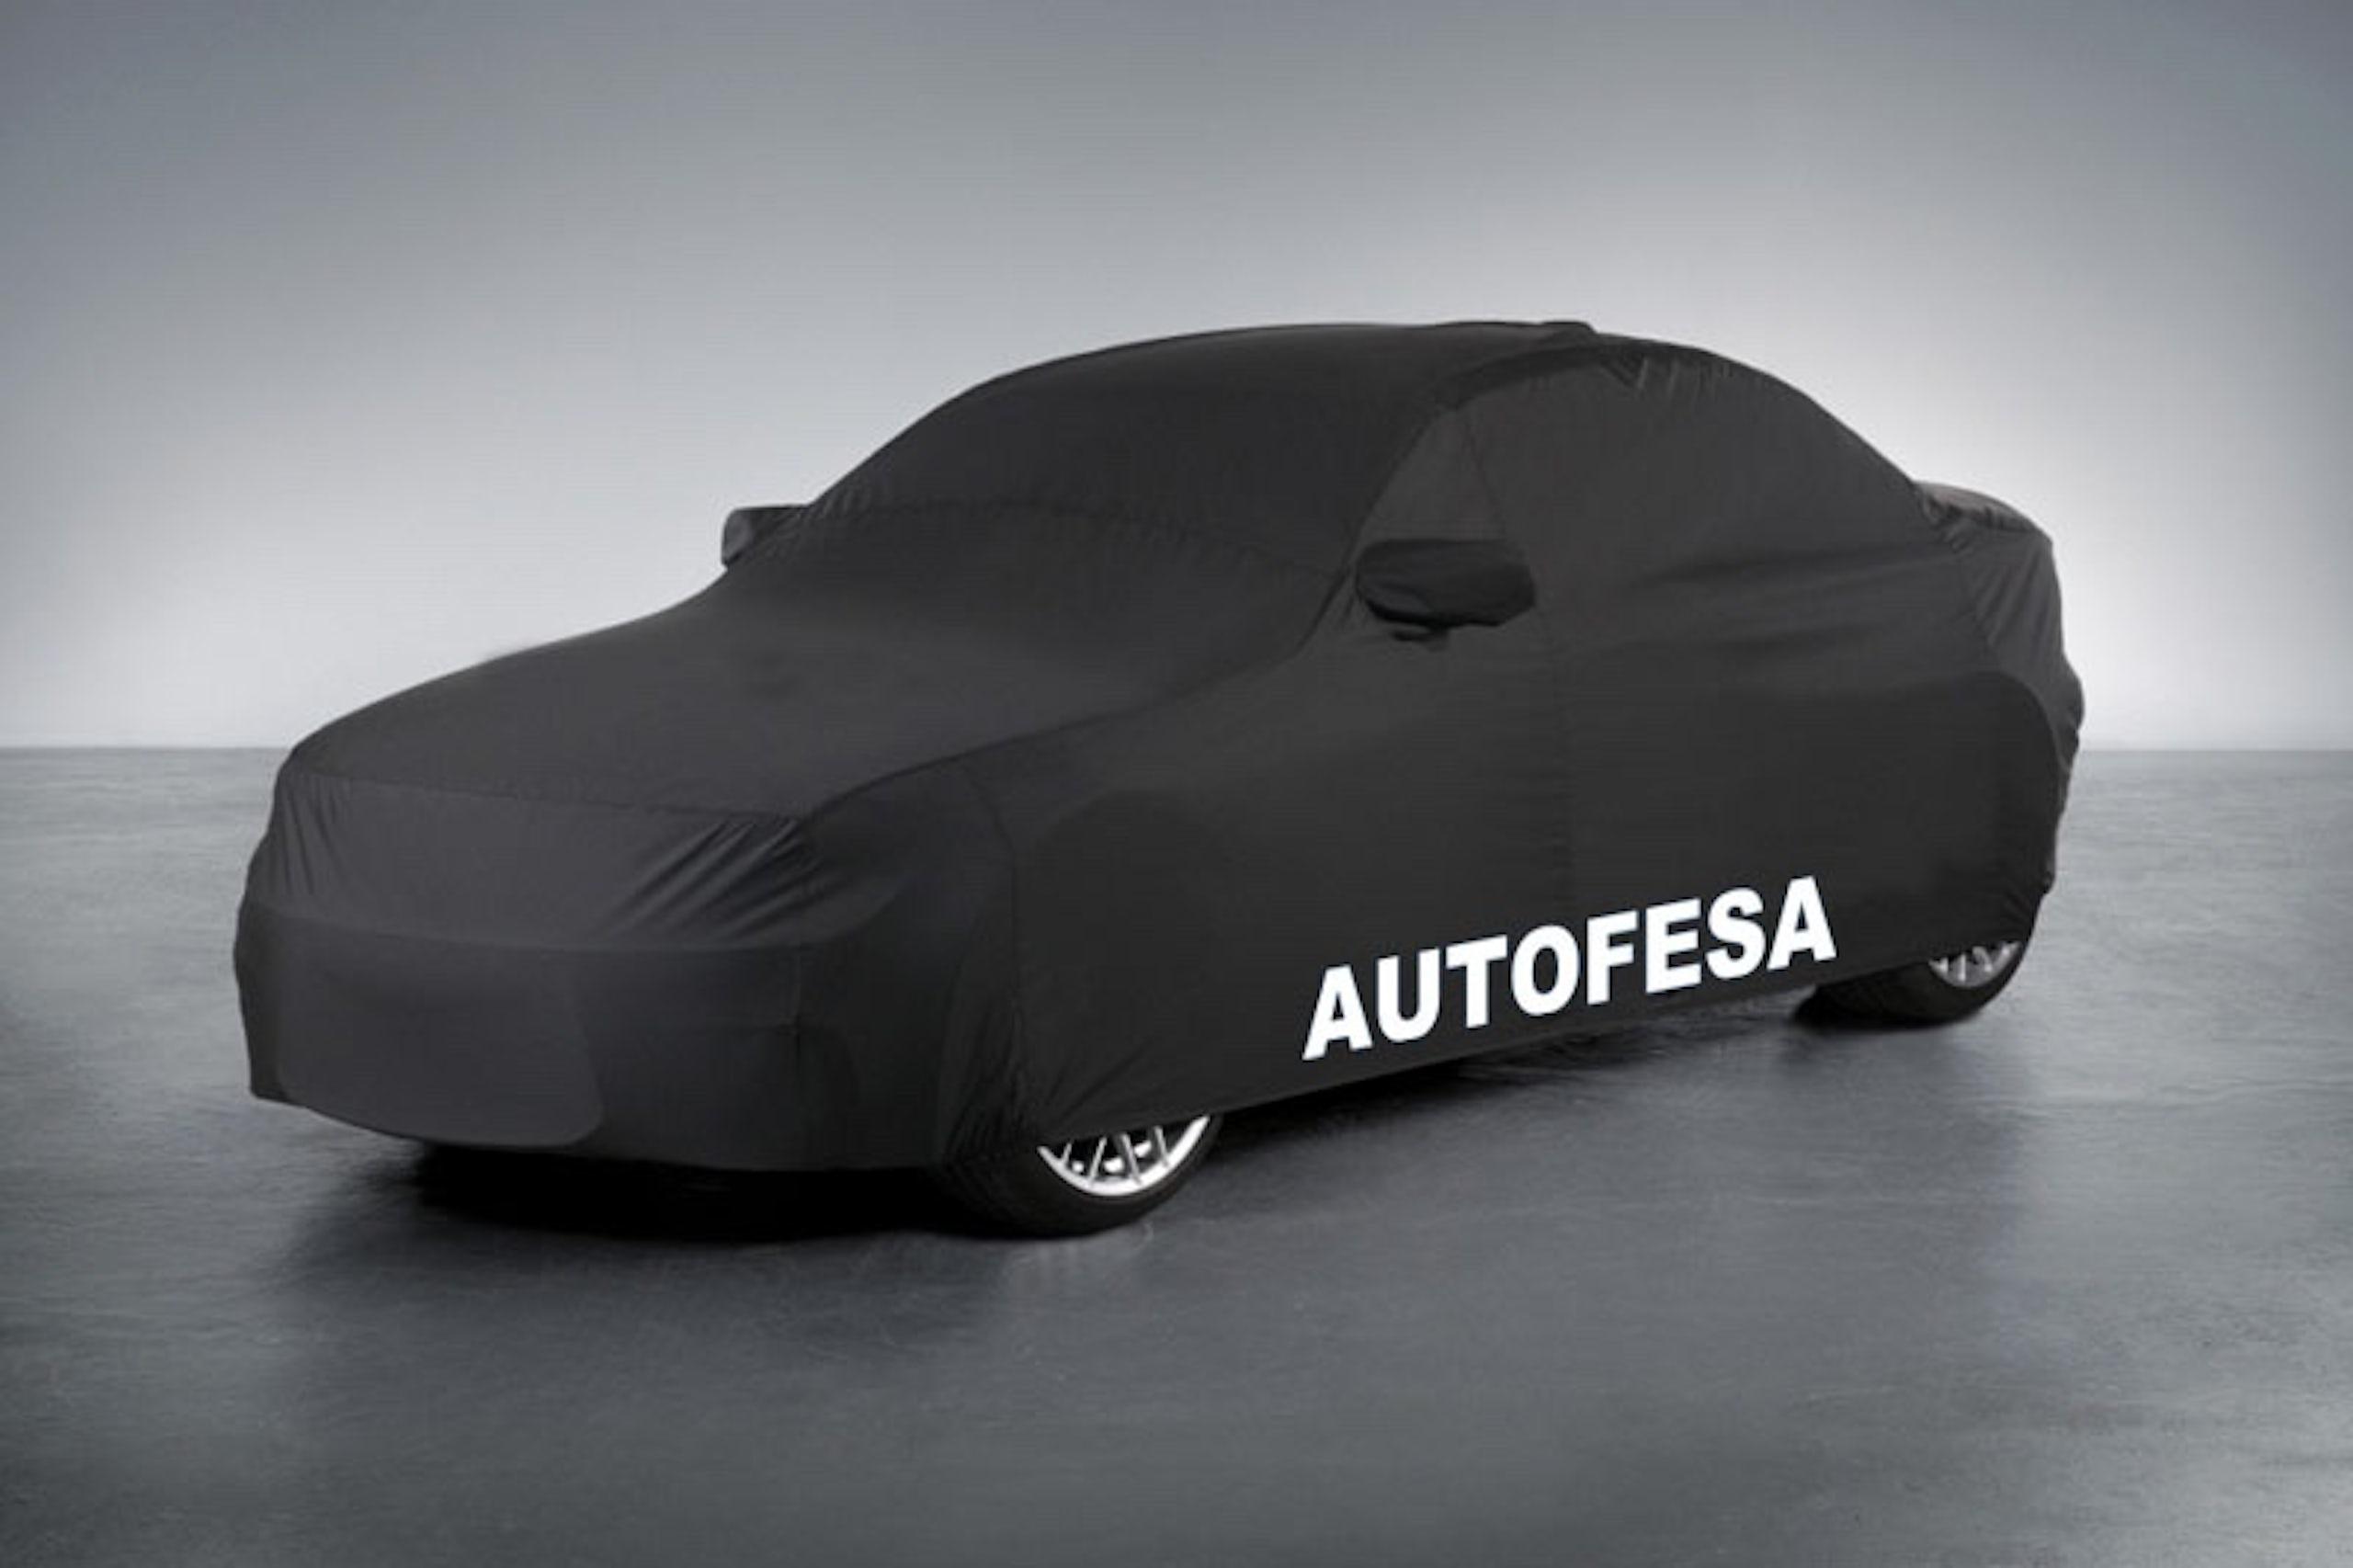 www.autofesa.com